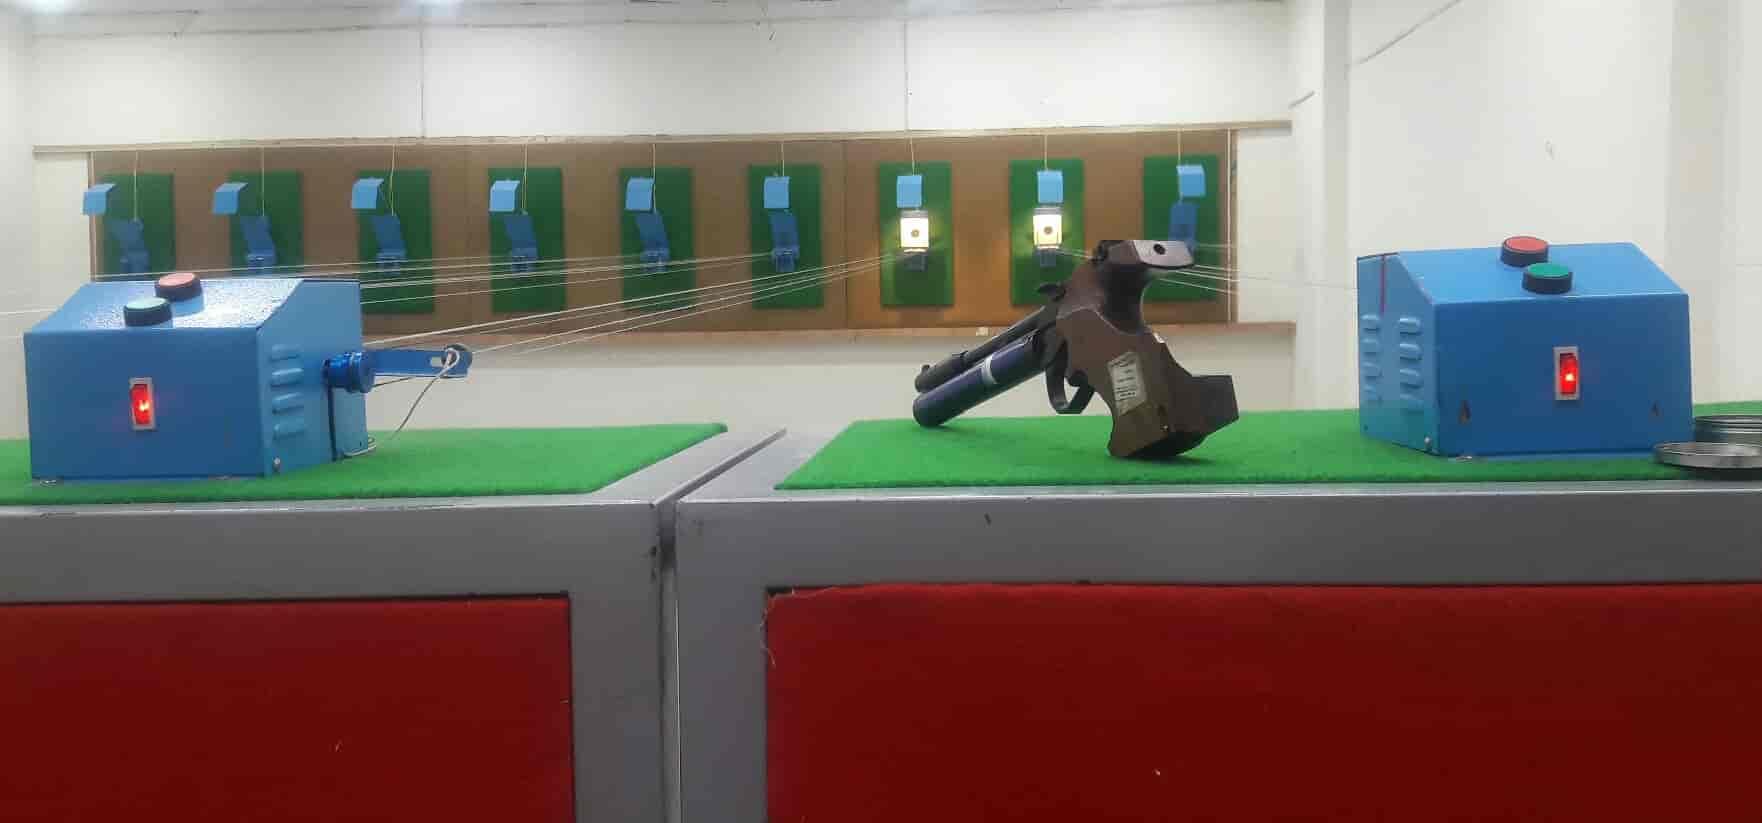 BSA Shooting Club, Vasundhara Sector 5 - Shooting Range in Delhi